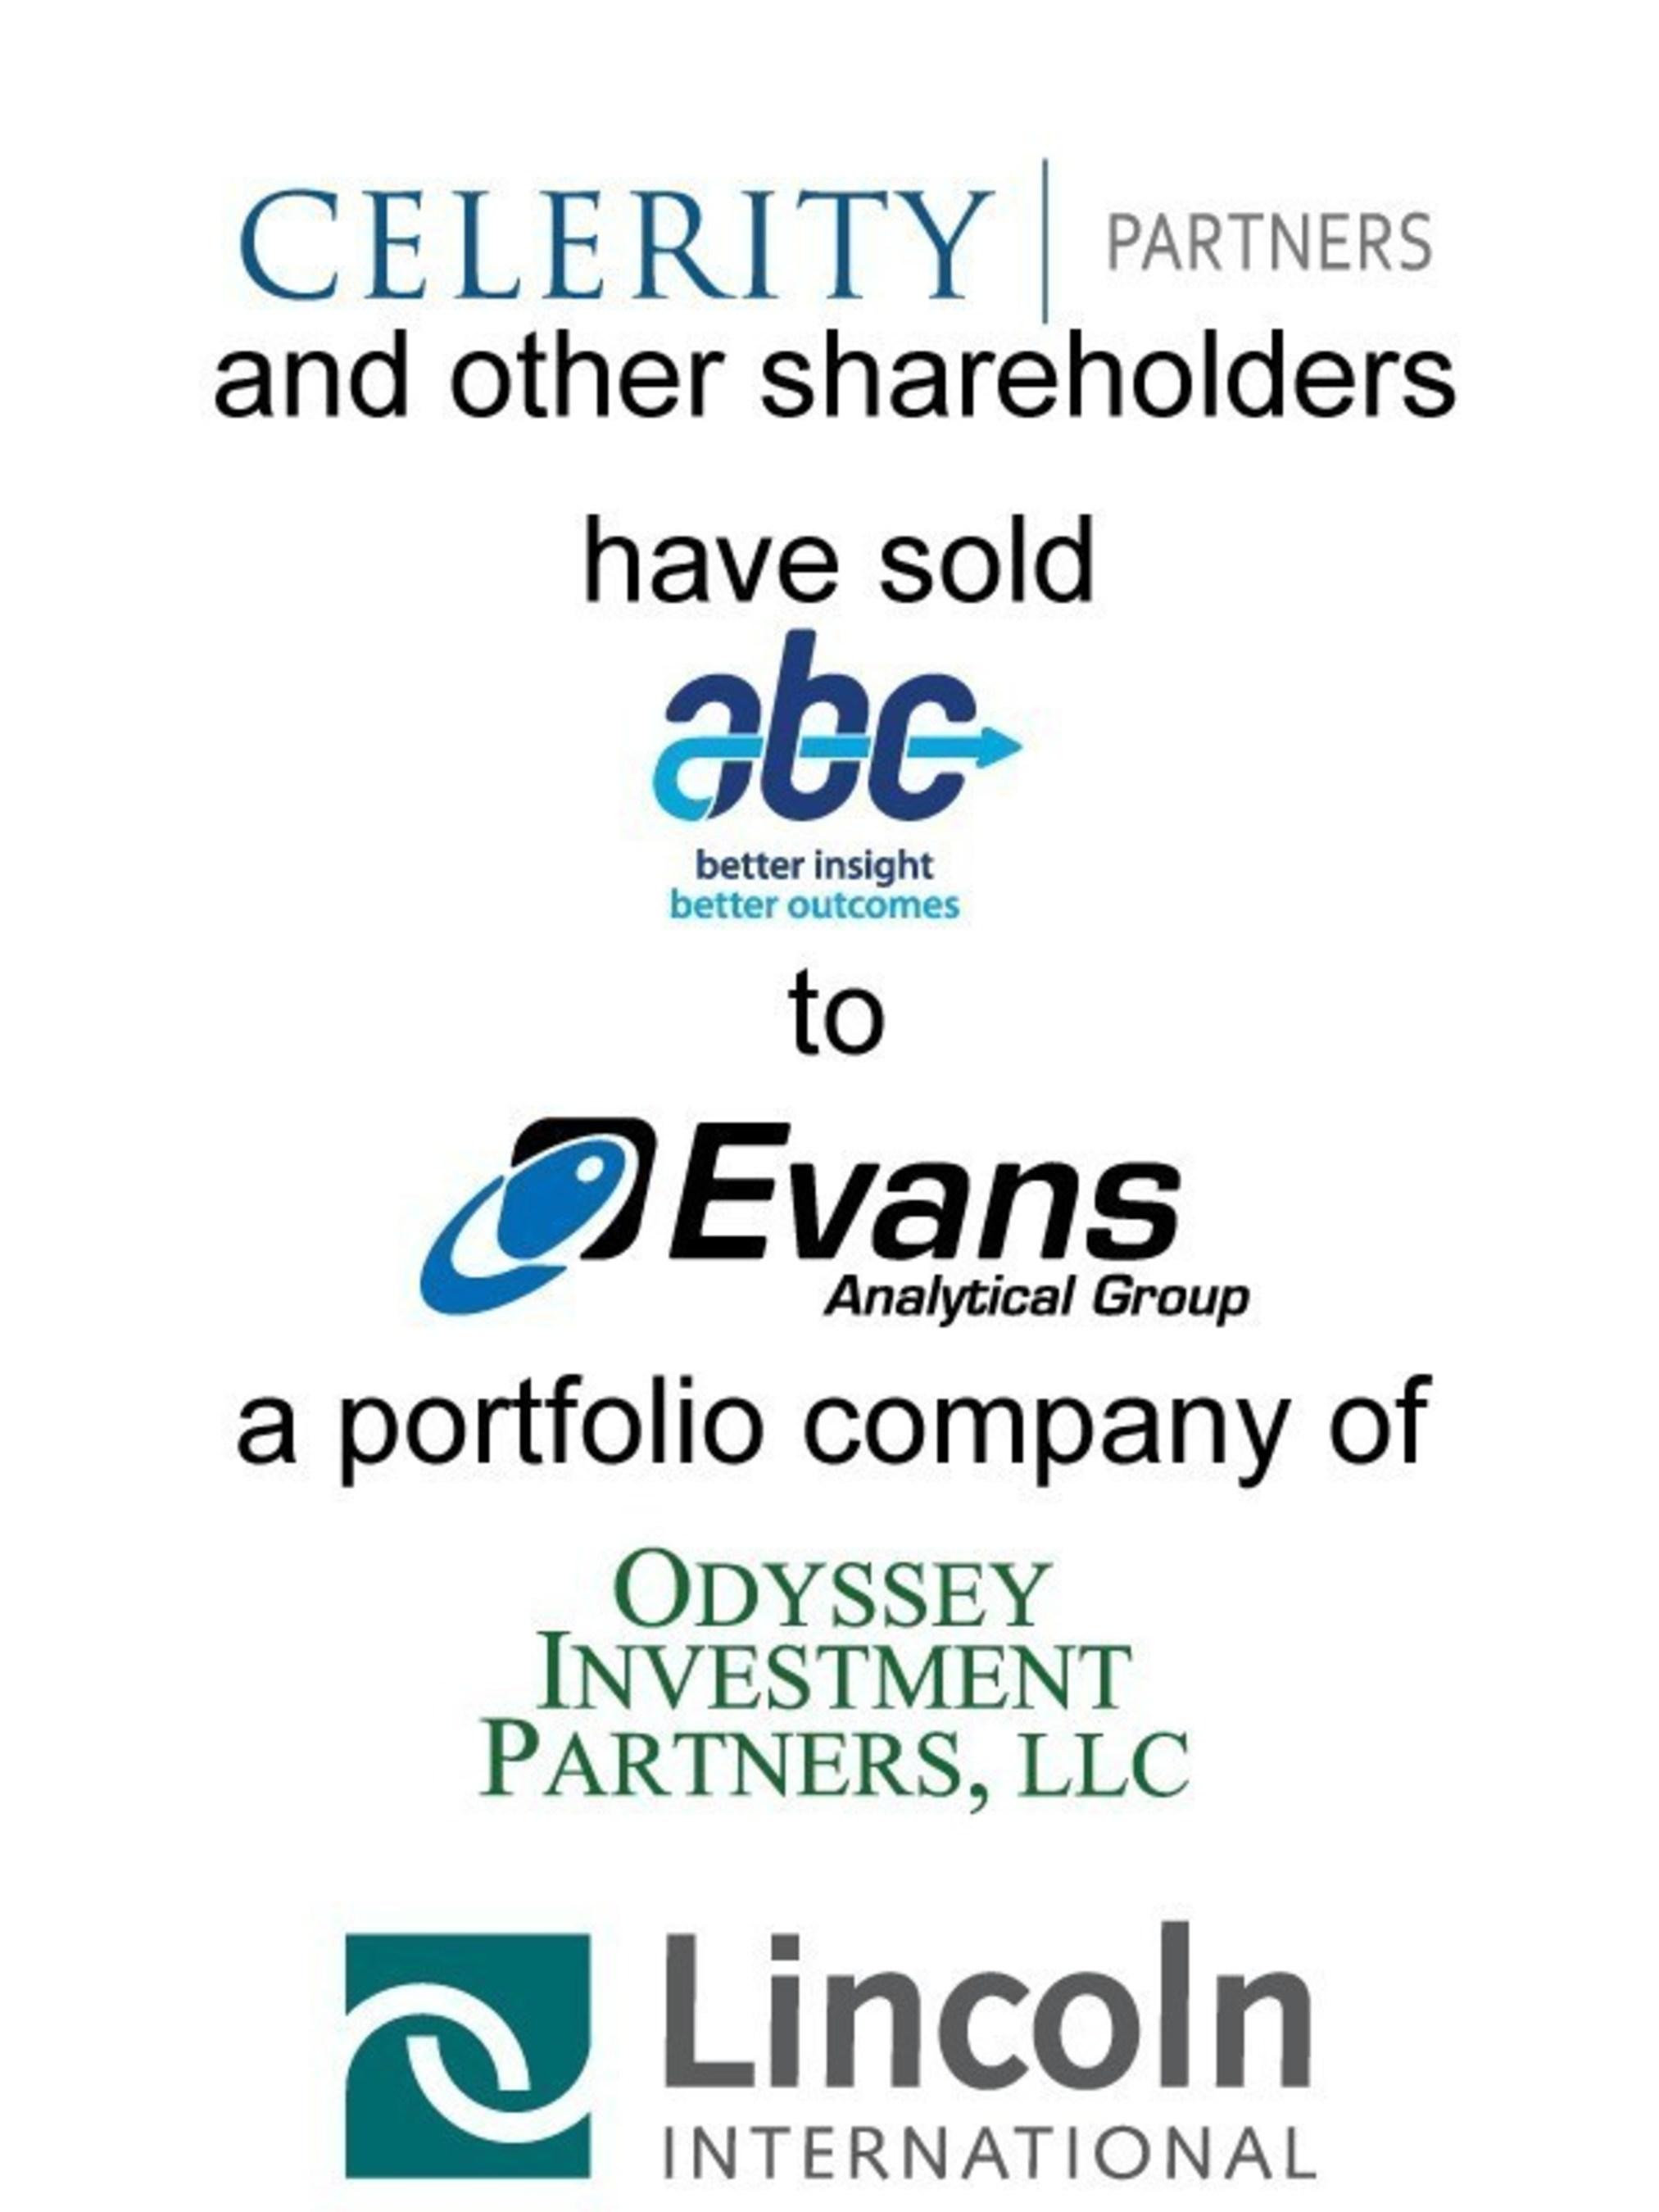 Lincoln International Represents ABC Laboratories in its Sale to EAG, Inc., a portfolio company of